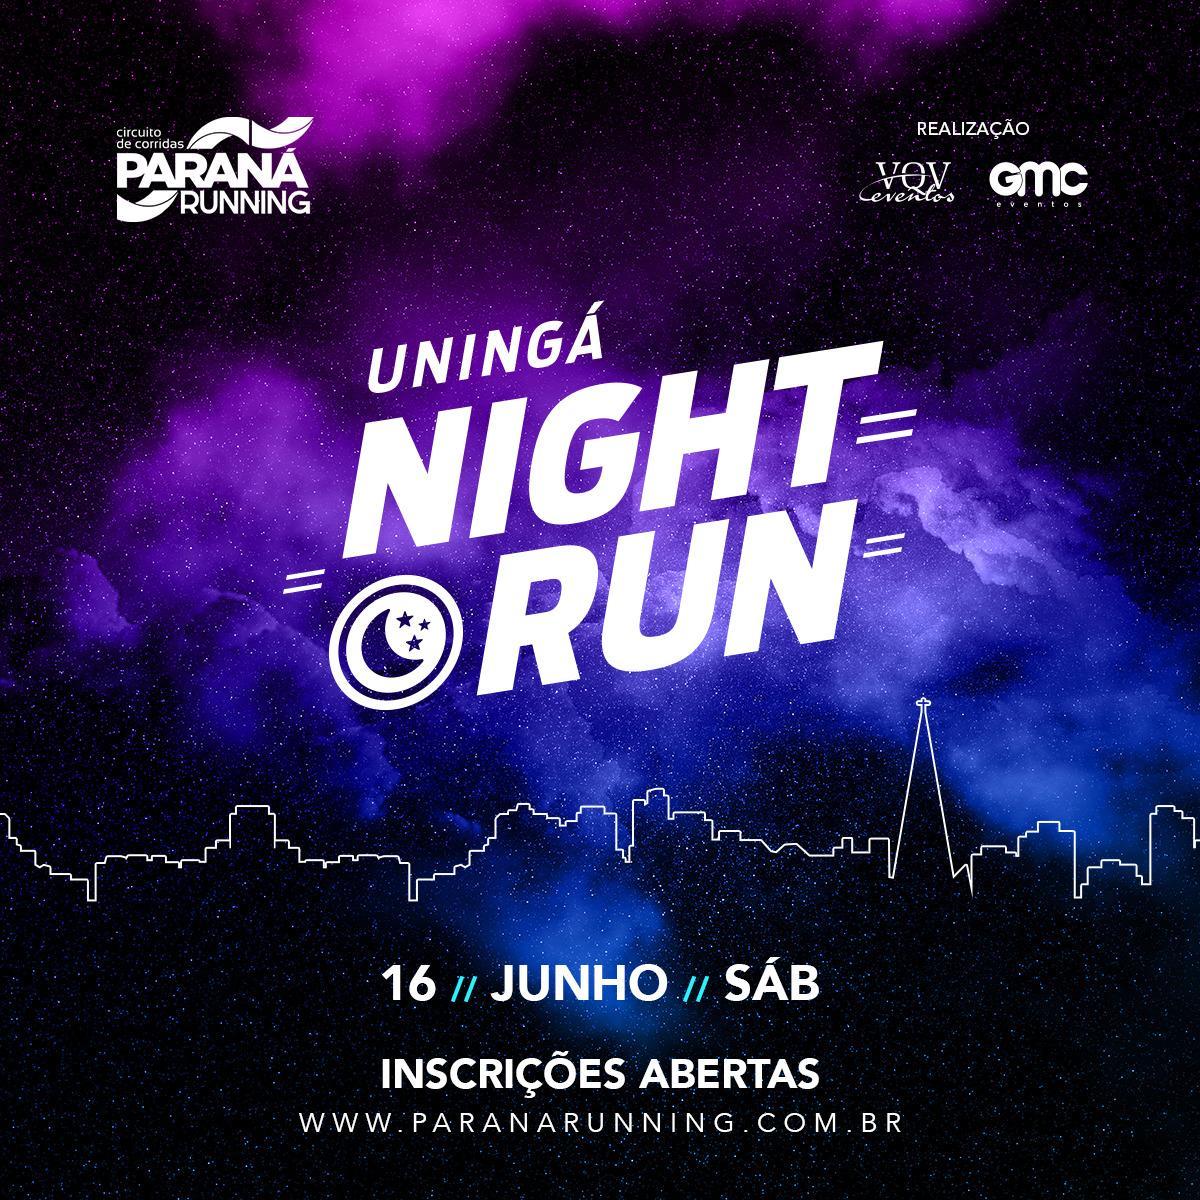 Paraná Running